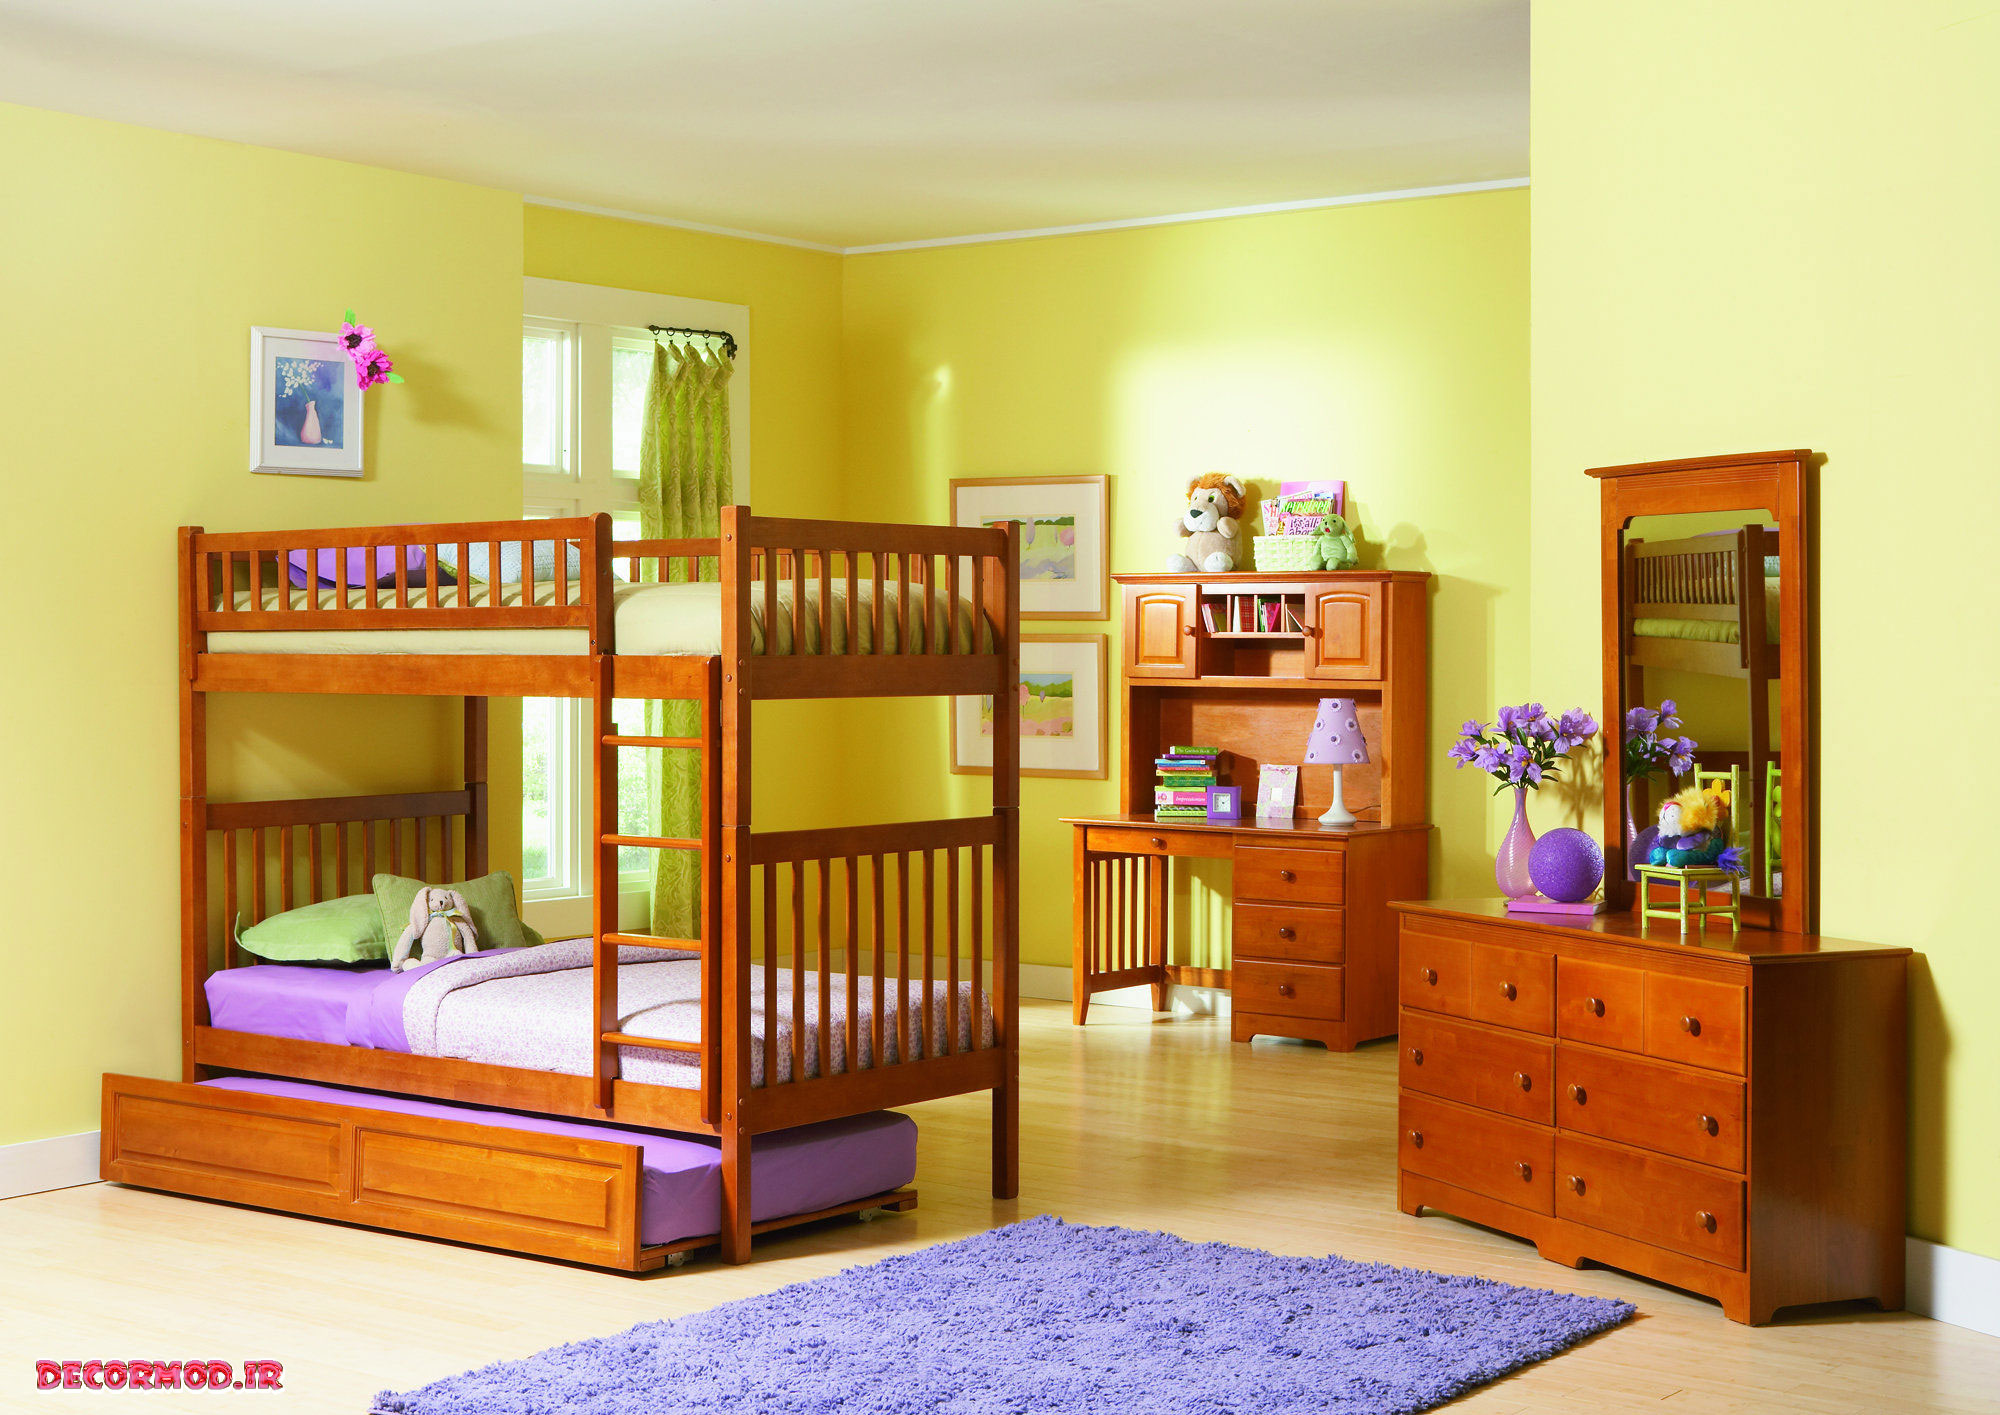 مدل سرویس خواب کودک 5